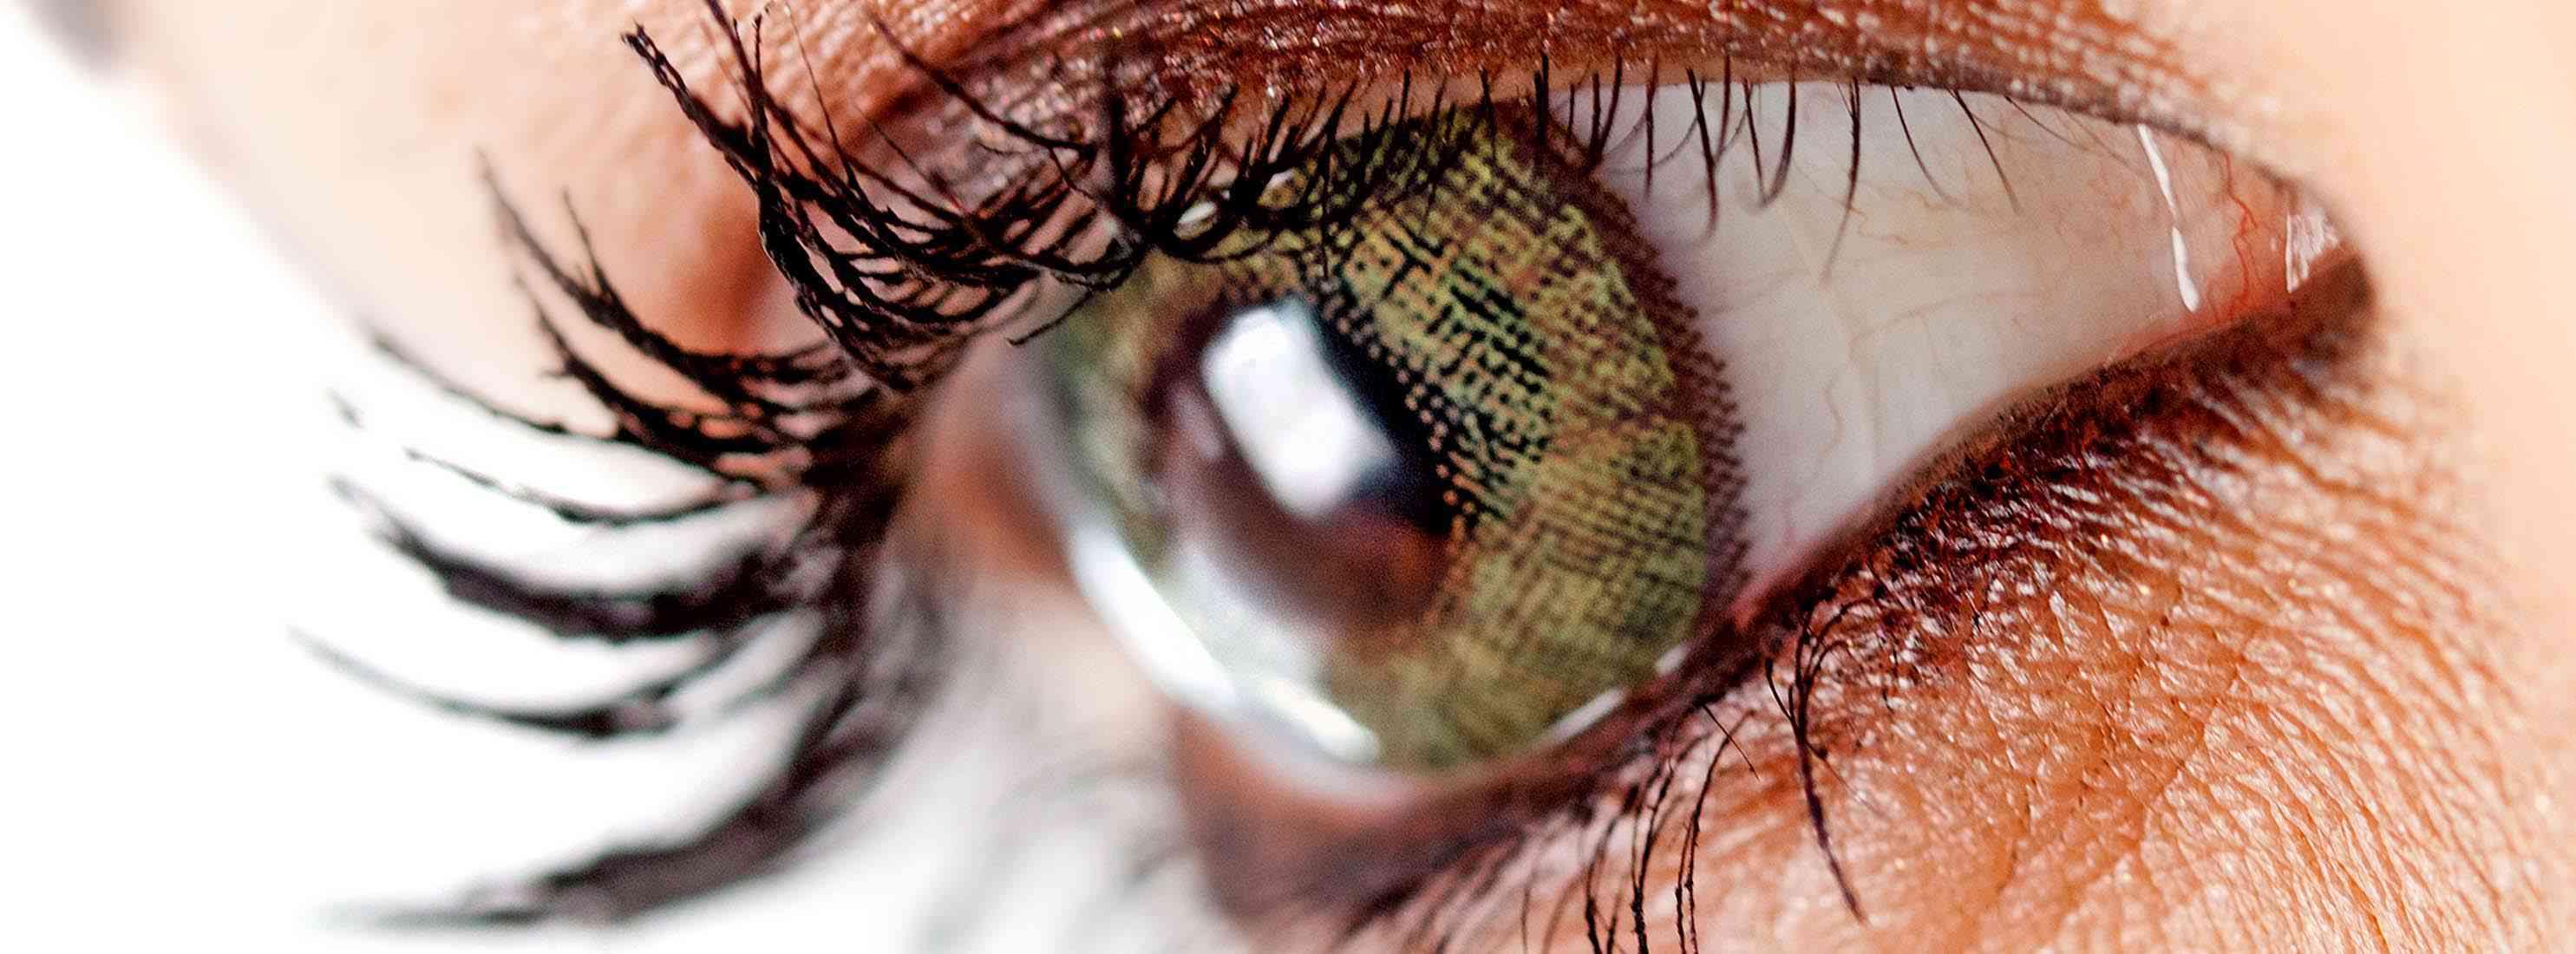 Freshkon Contact Lenses 06 2970x1100